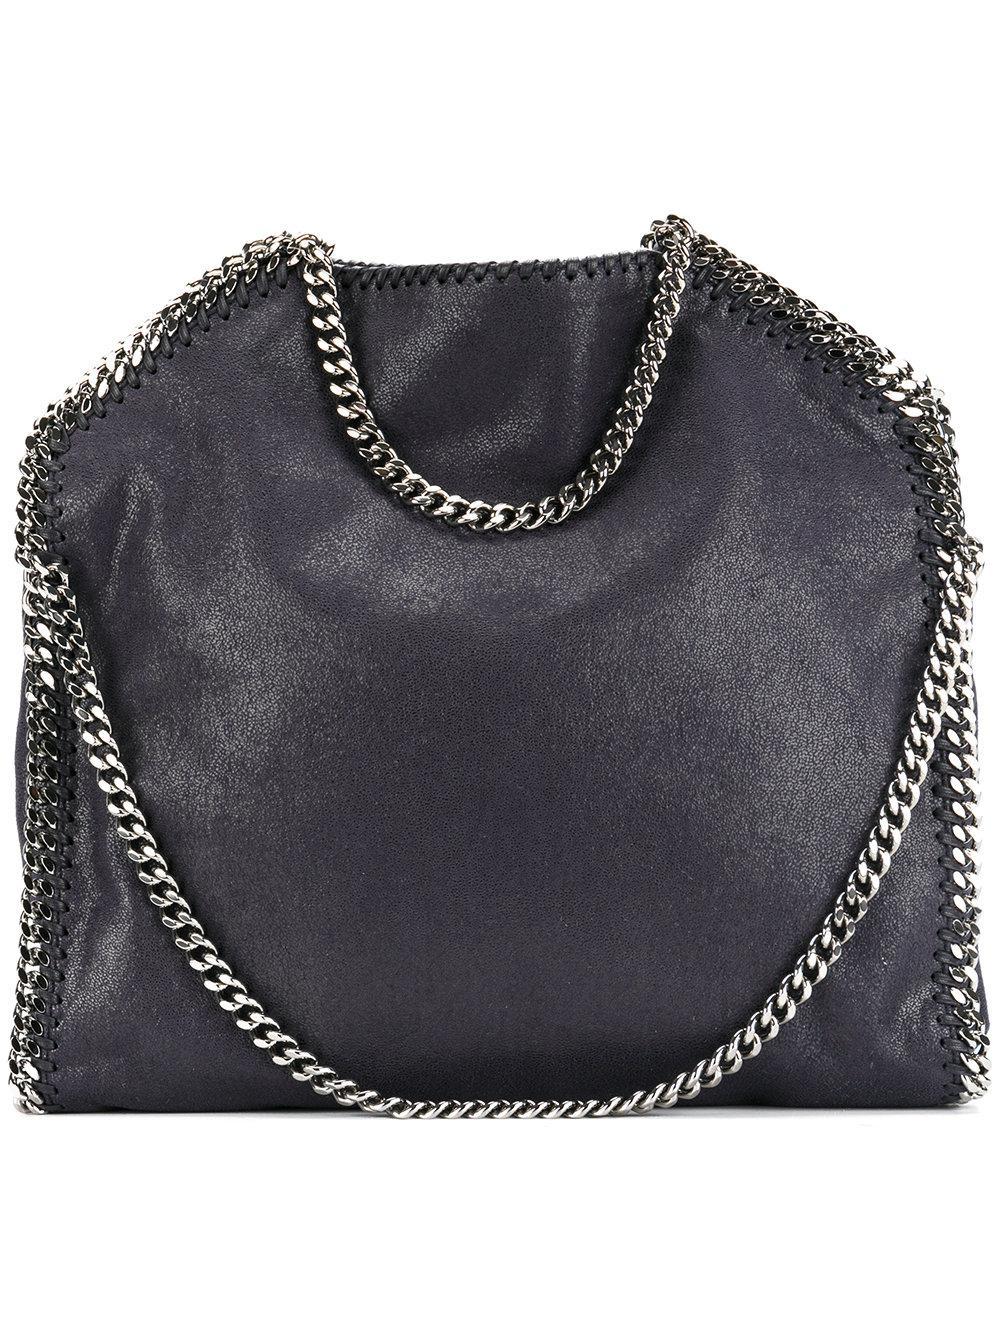 Lyst - Stella McCartney Falabella 3chain Small Tote Bag in Blue ... d56b41b1fc0d9